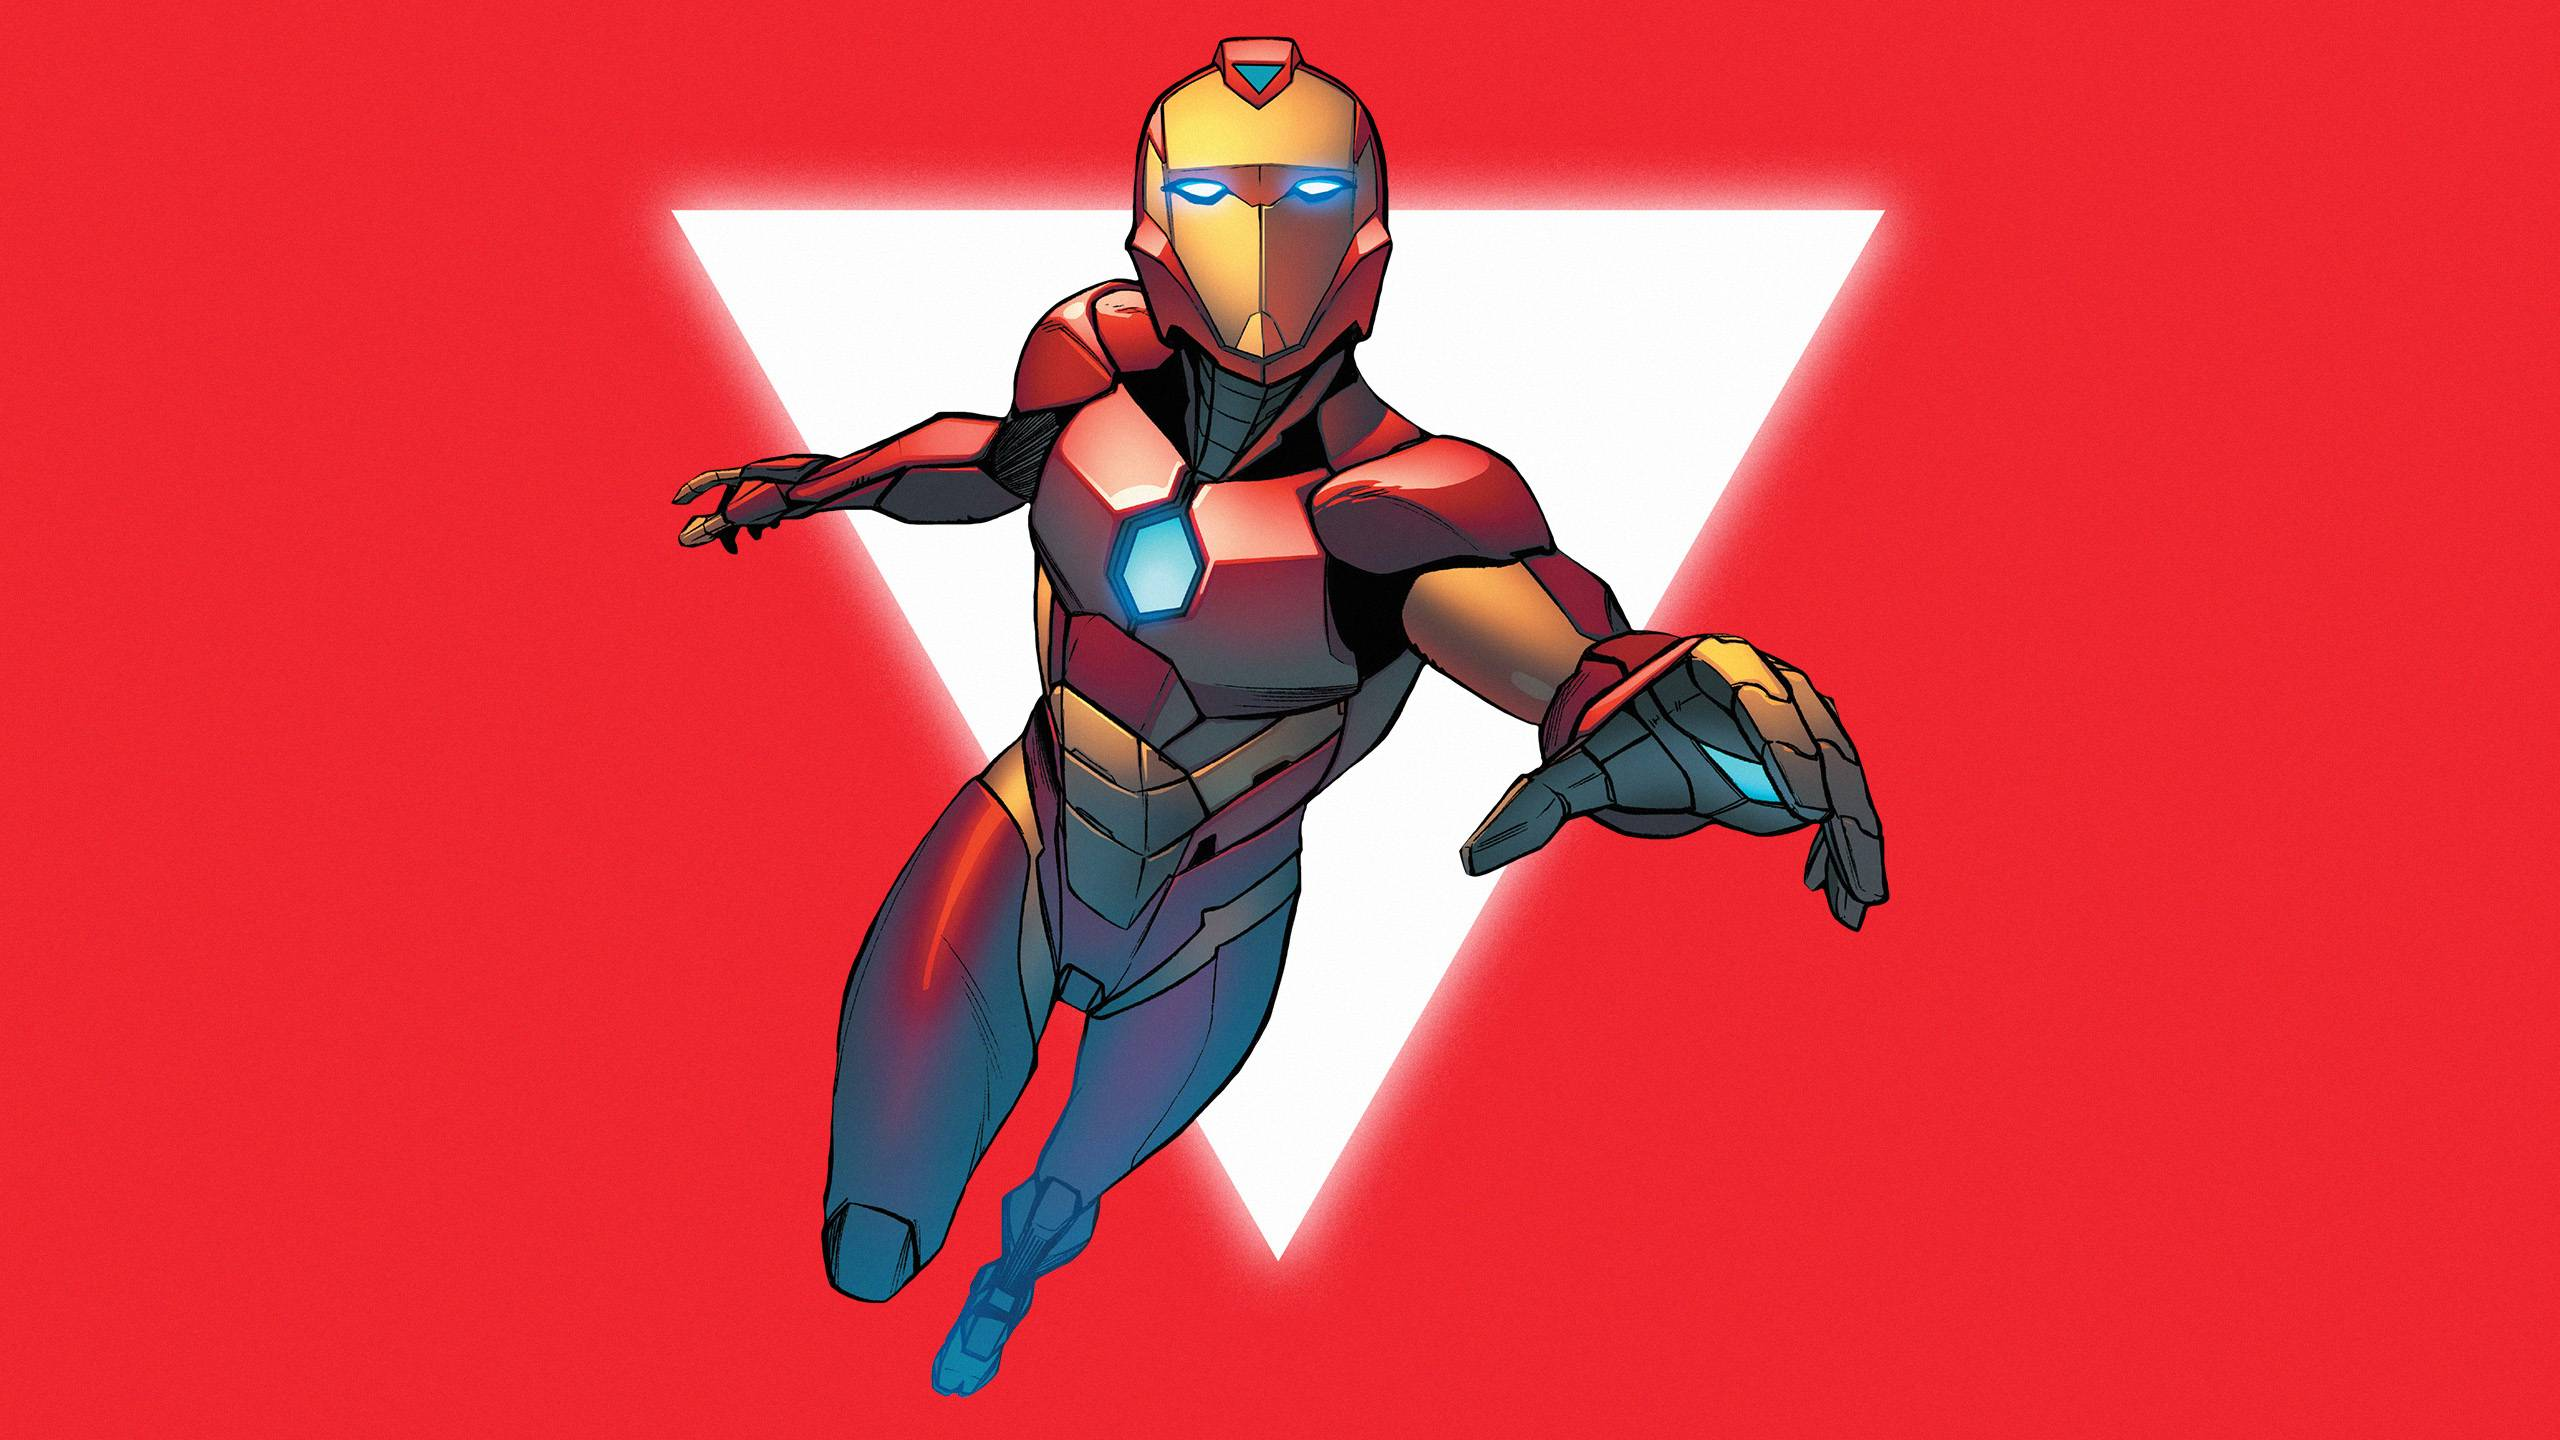 Iron Man Wallpaper 61 2560x1440